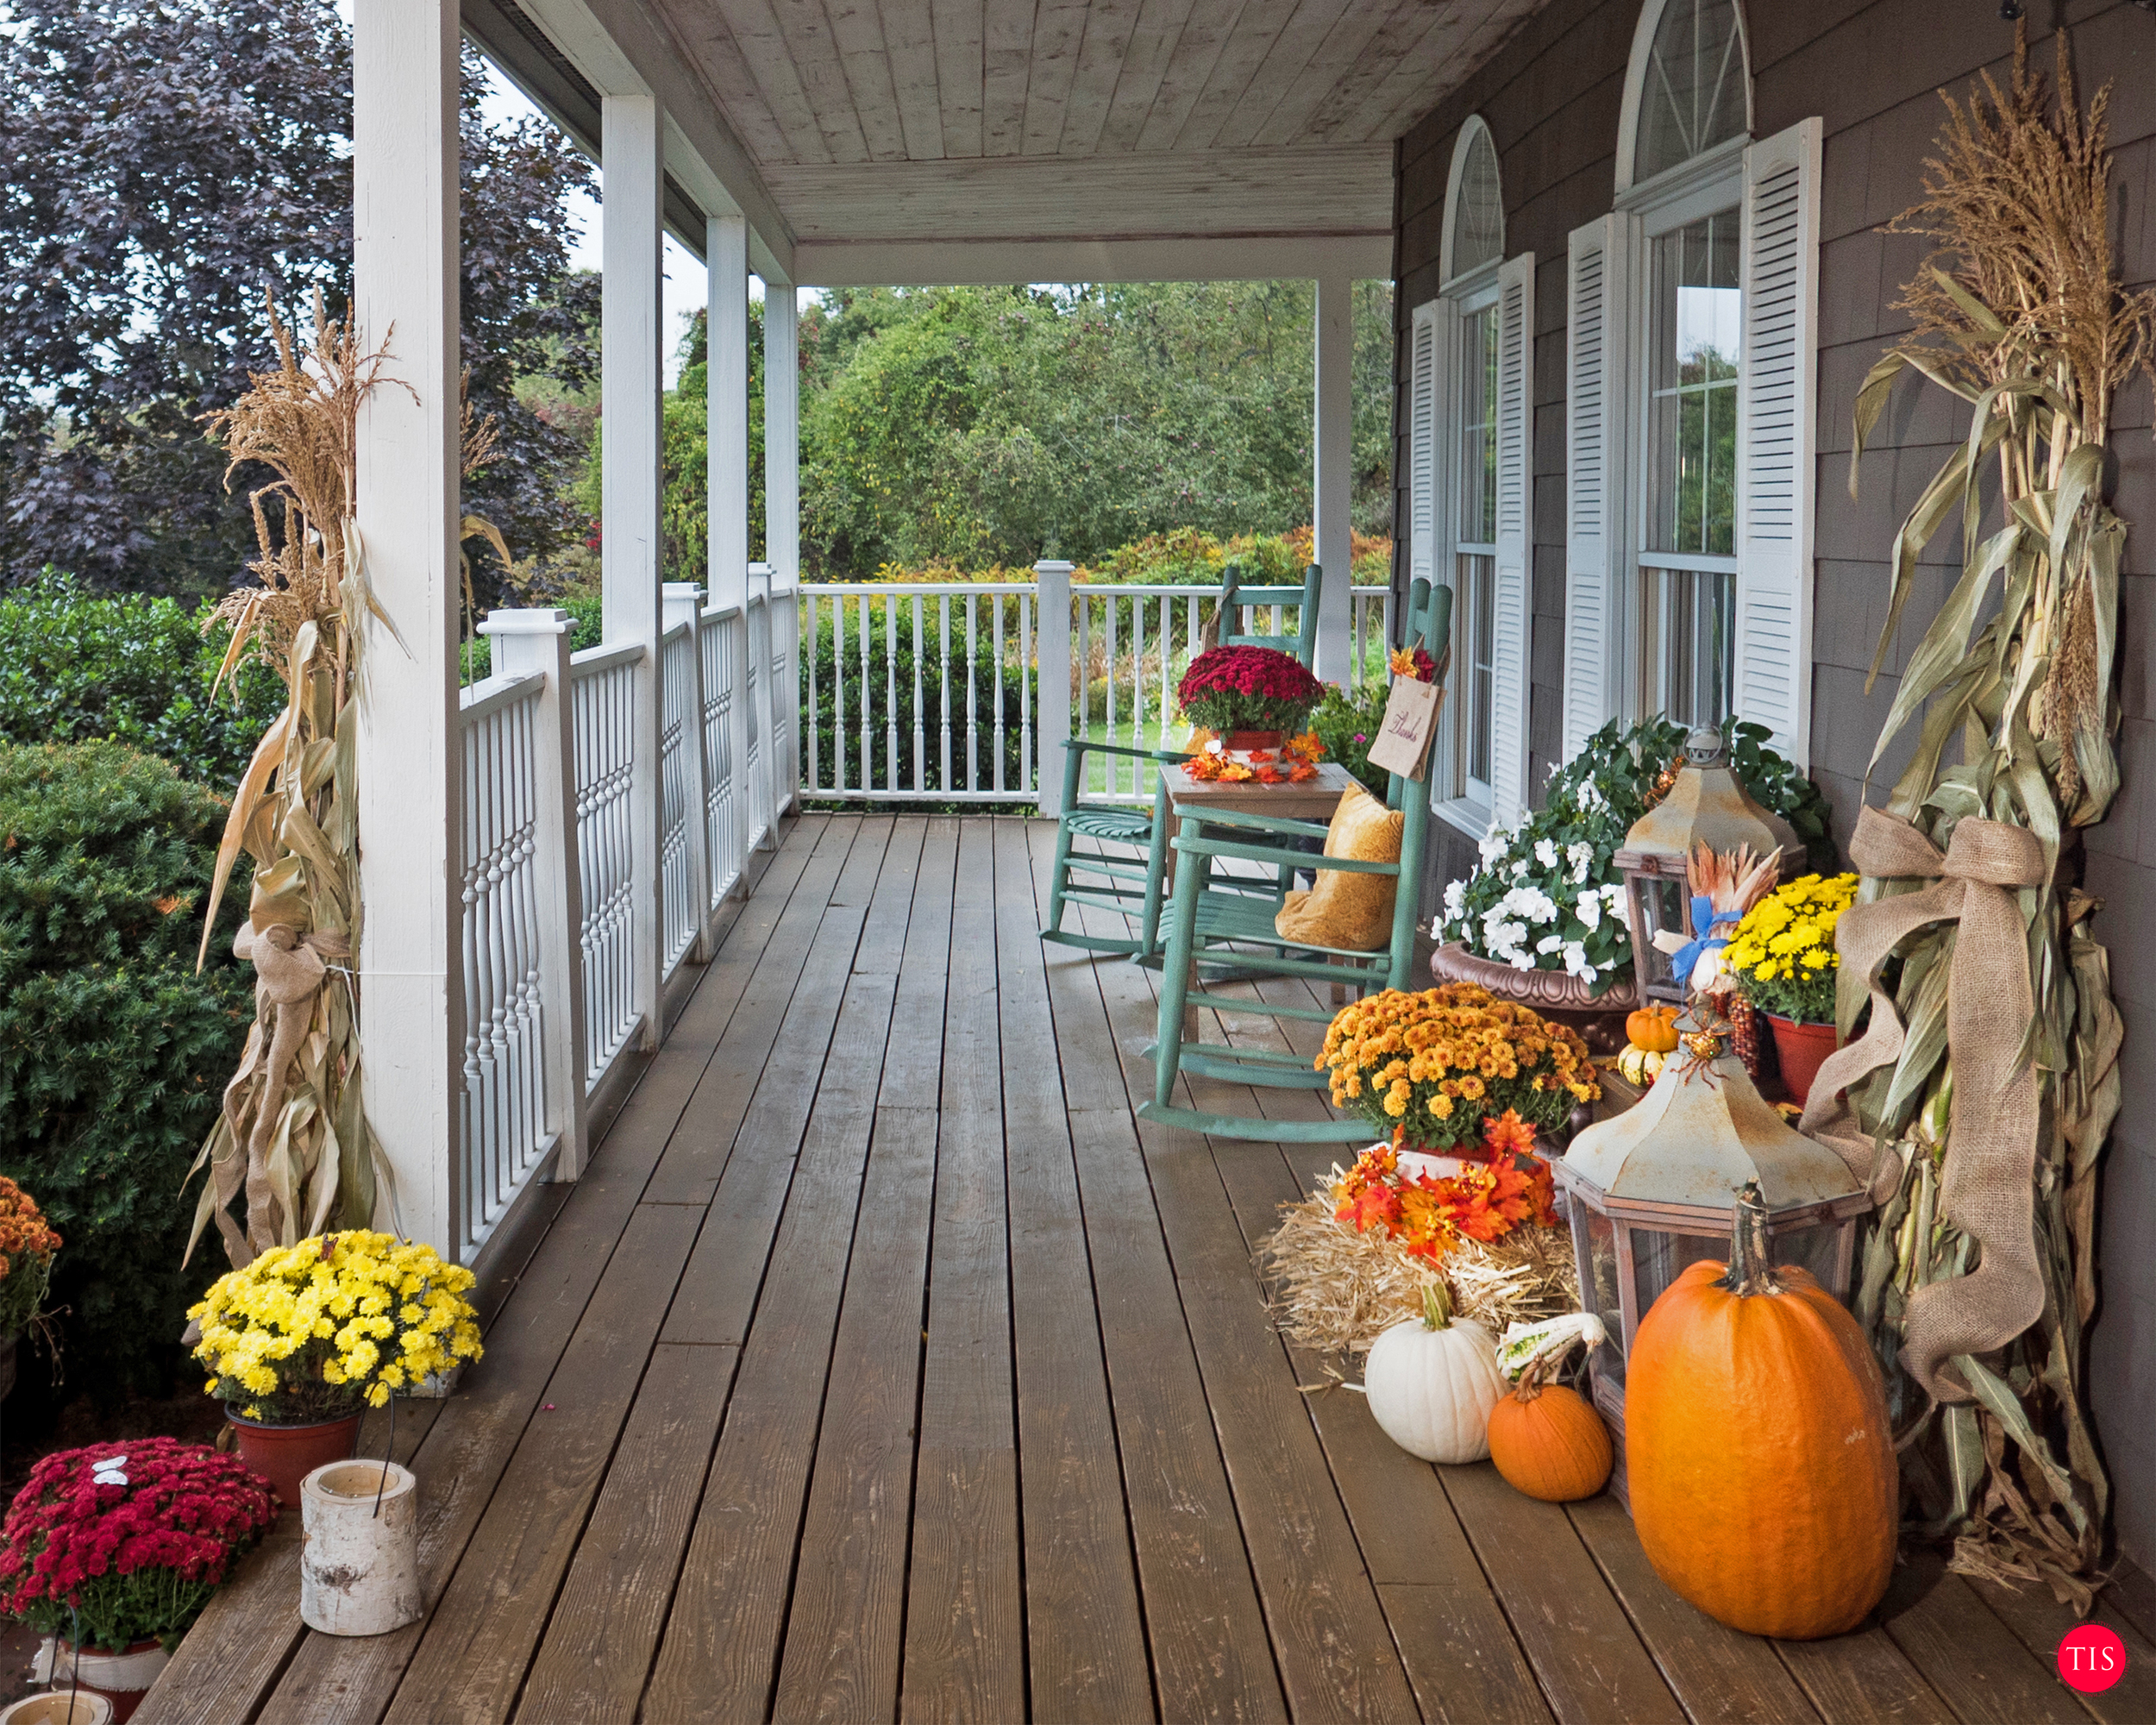 Fall Decor for the Porch